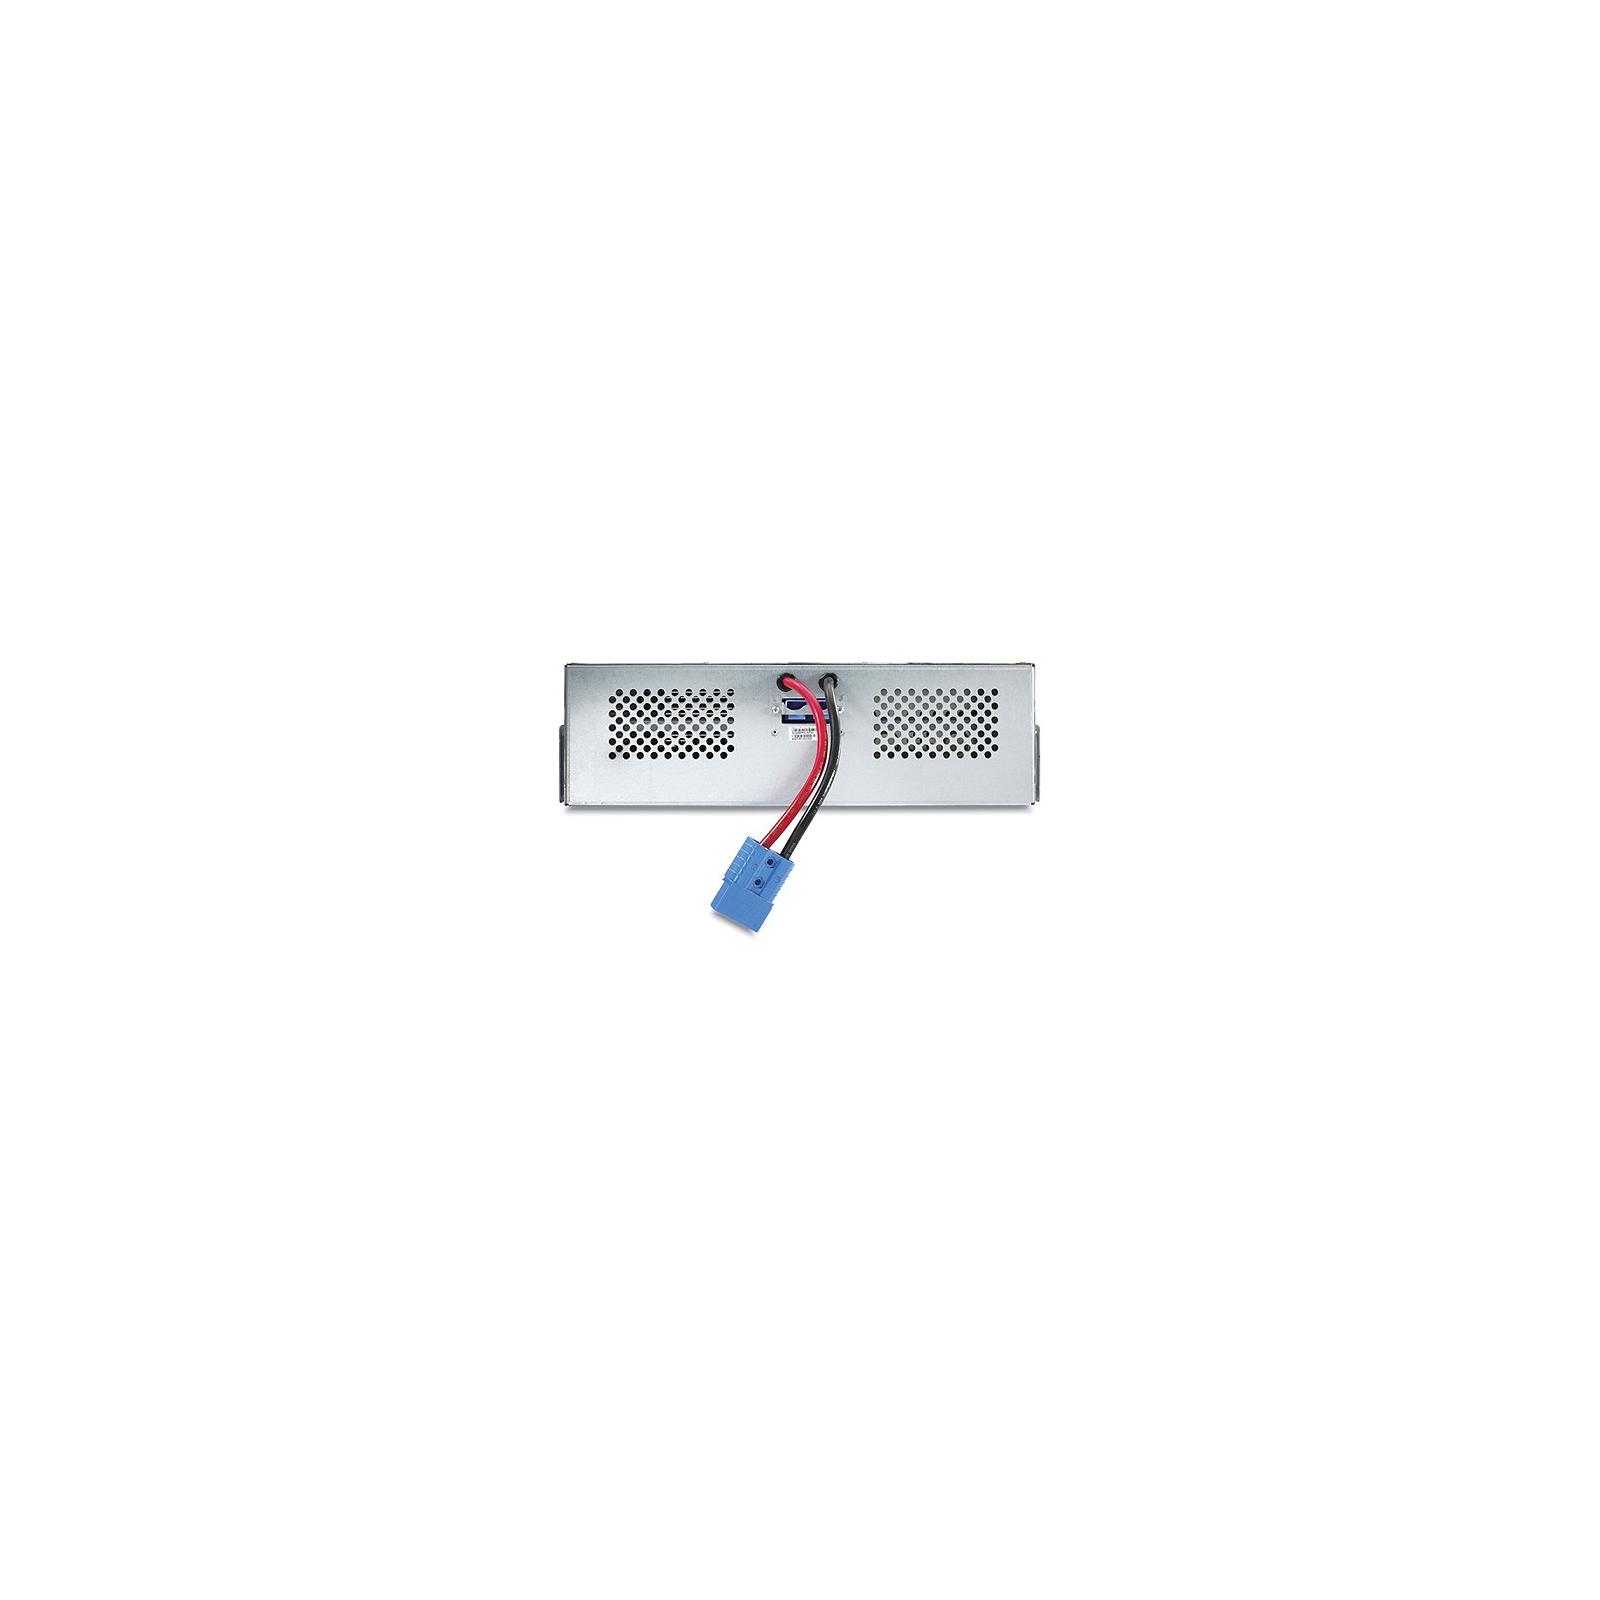 Батарея к ИБП Smart-UPS XL 2200/ 3000, RM (3U) APC (SUA48RMXLBP3U) изображение 3